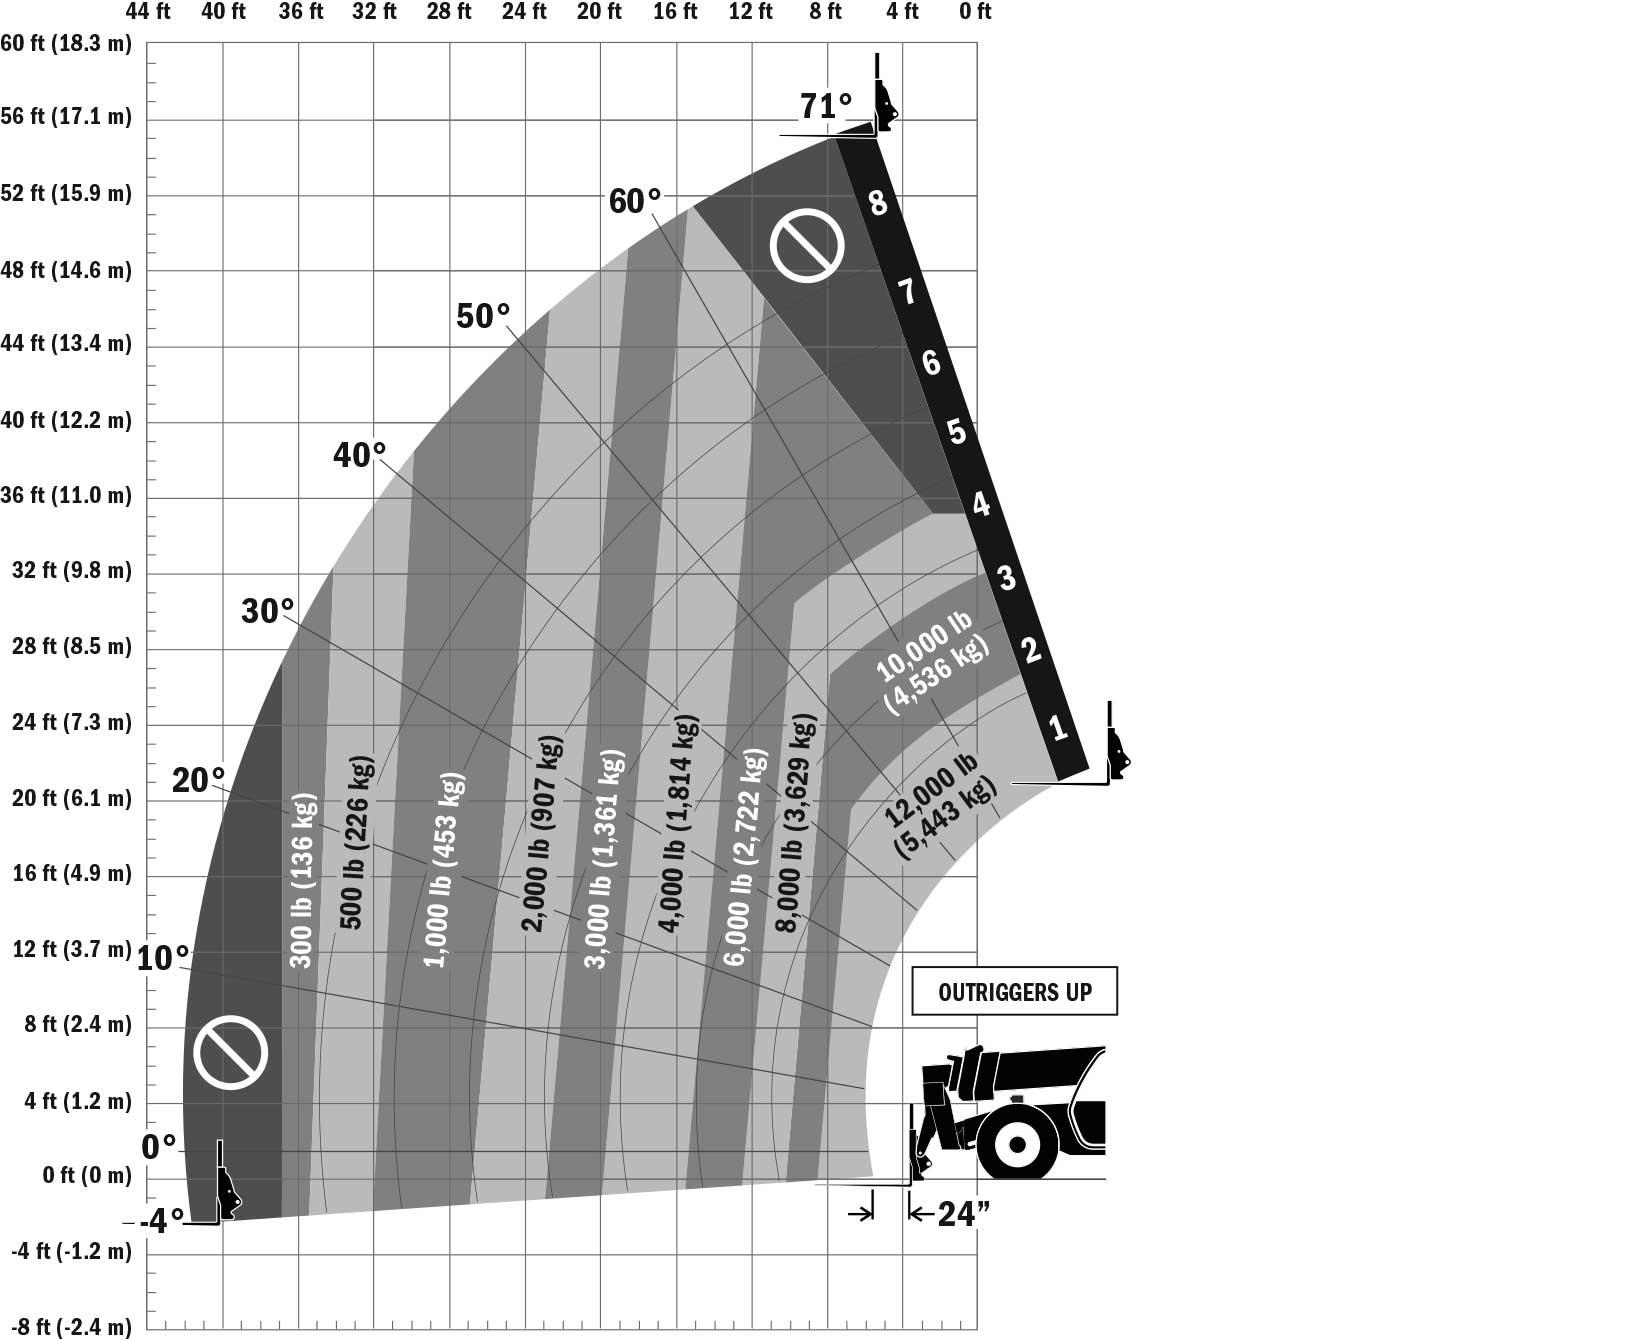 JLG 1255 Telehandler Load Chart Outrigger Up